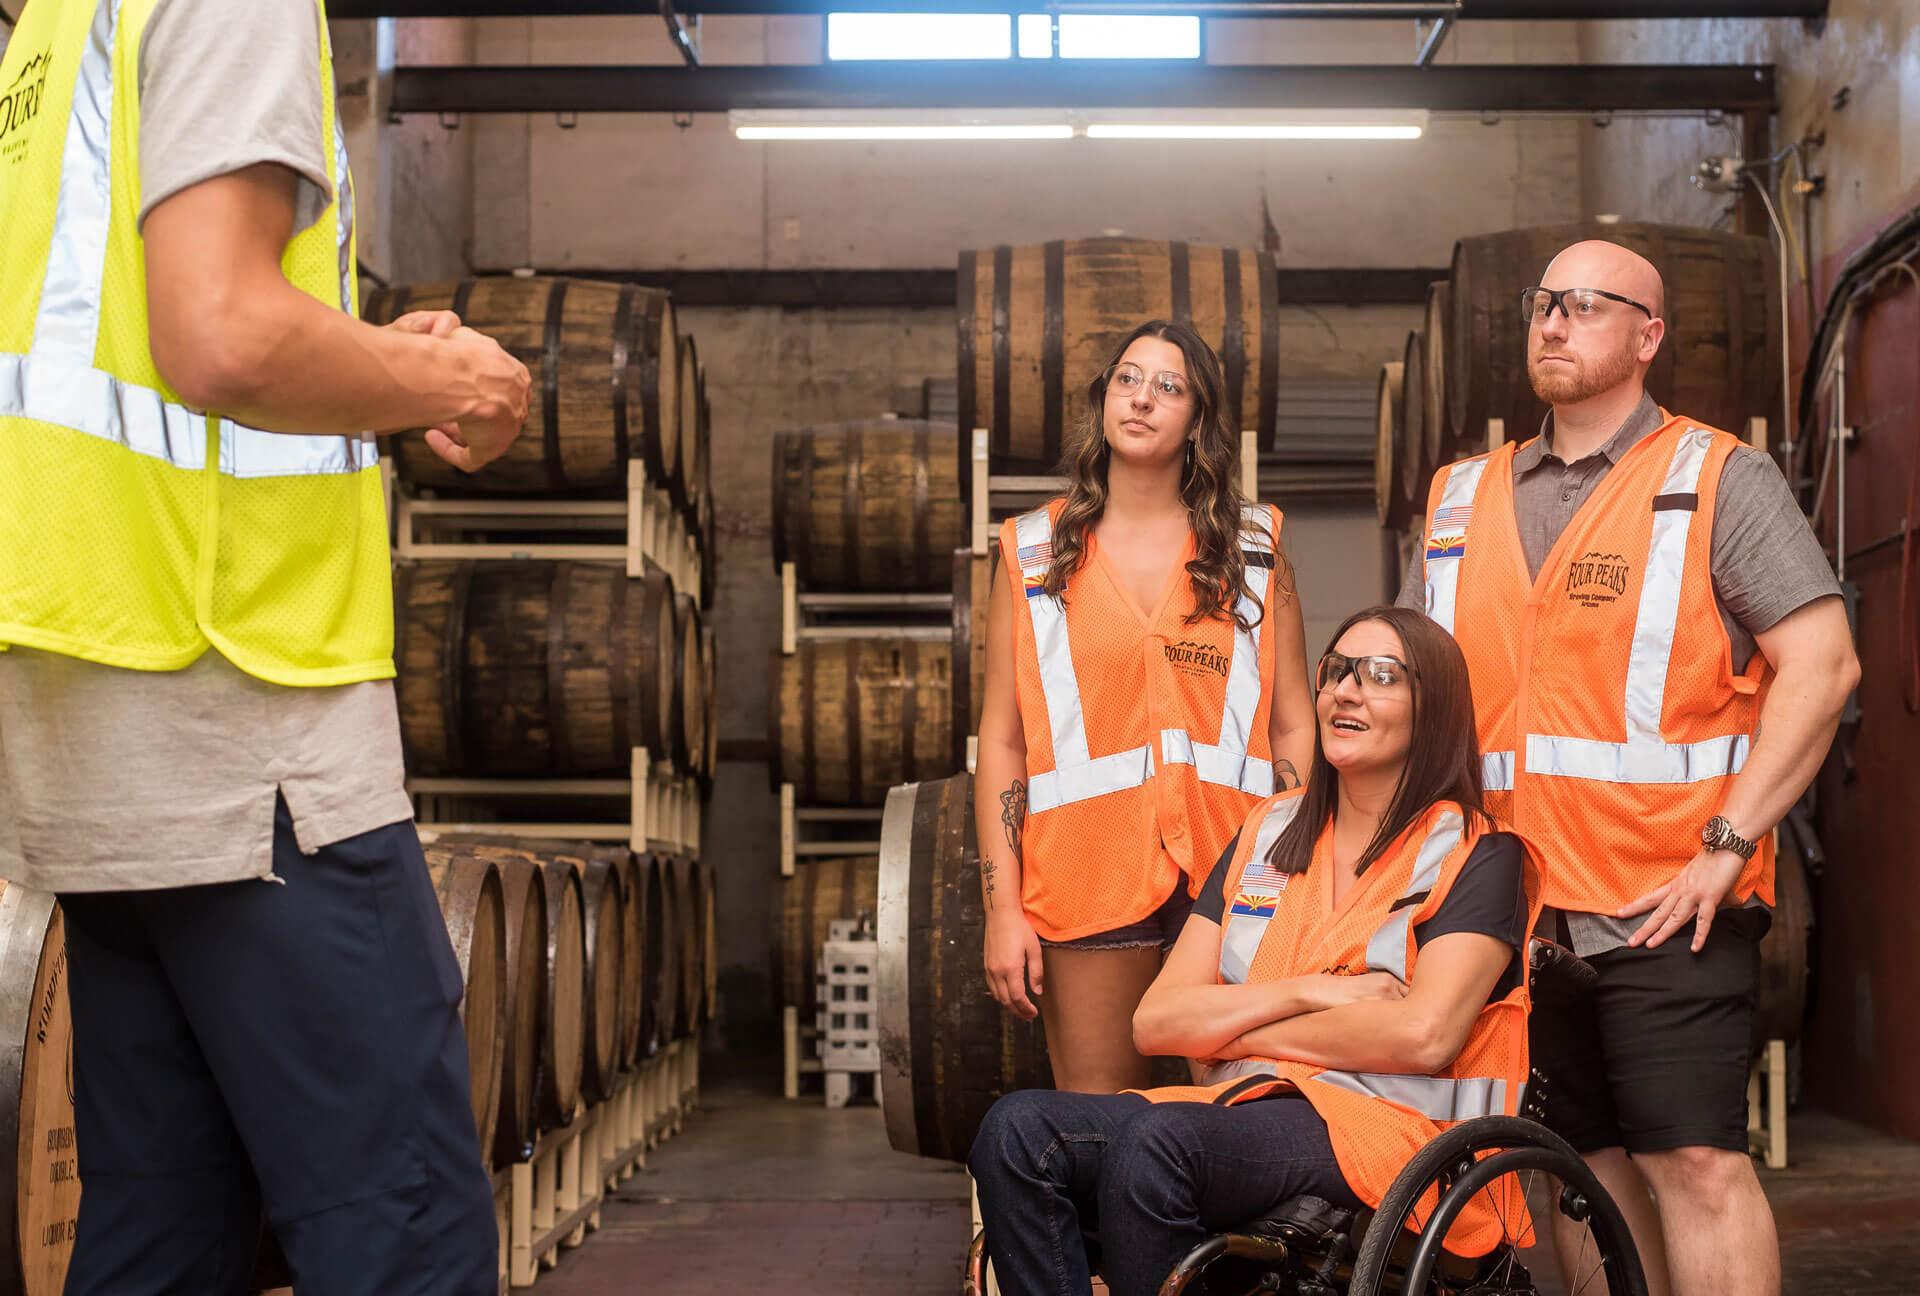 people-wearing-orange-safety-vests